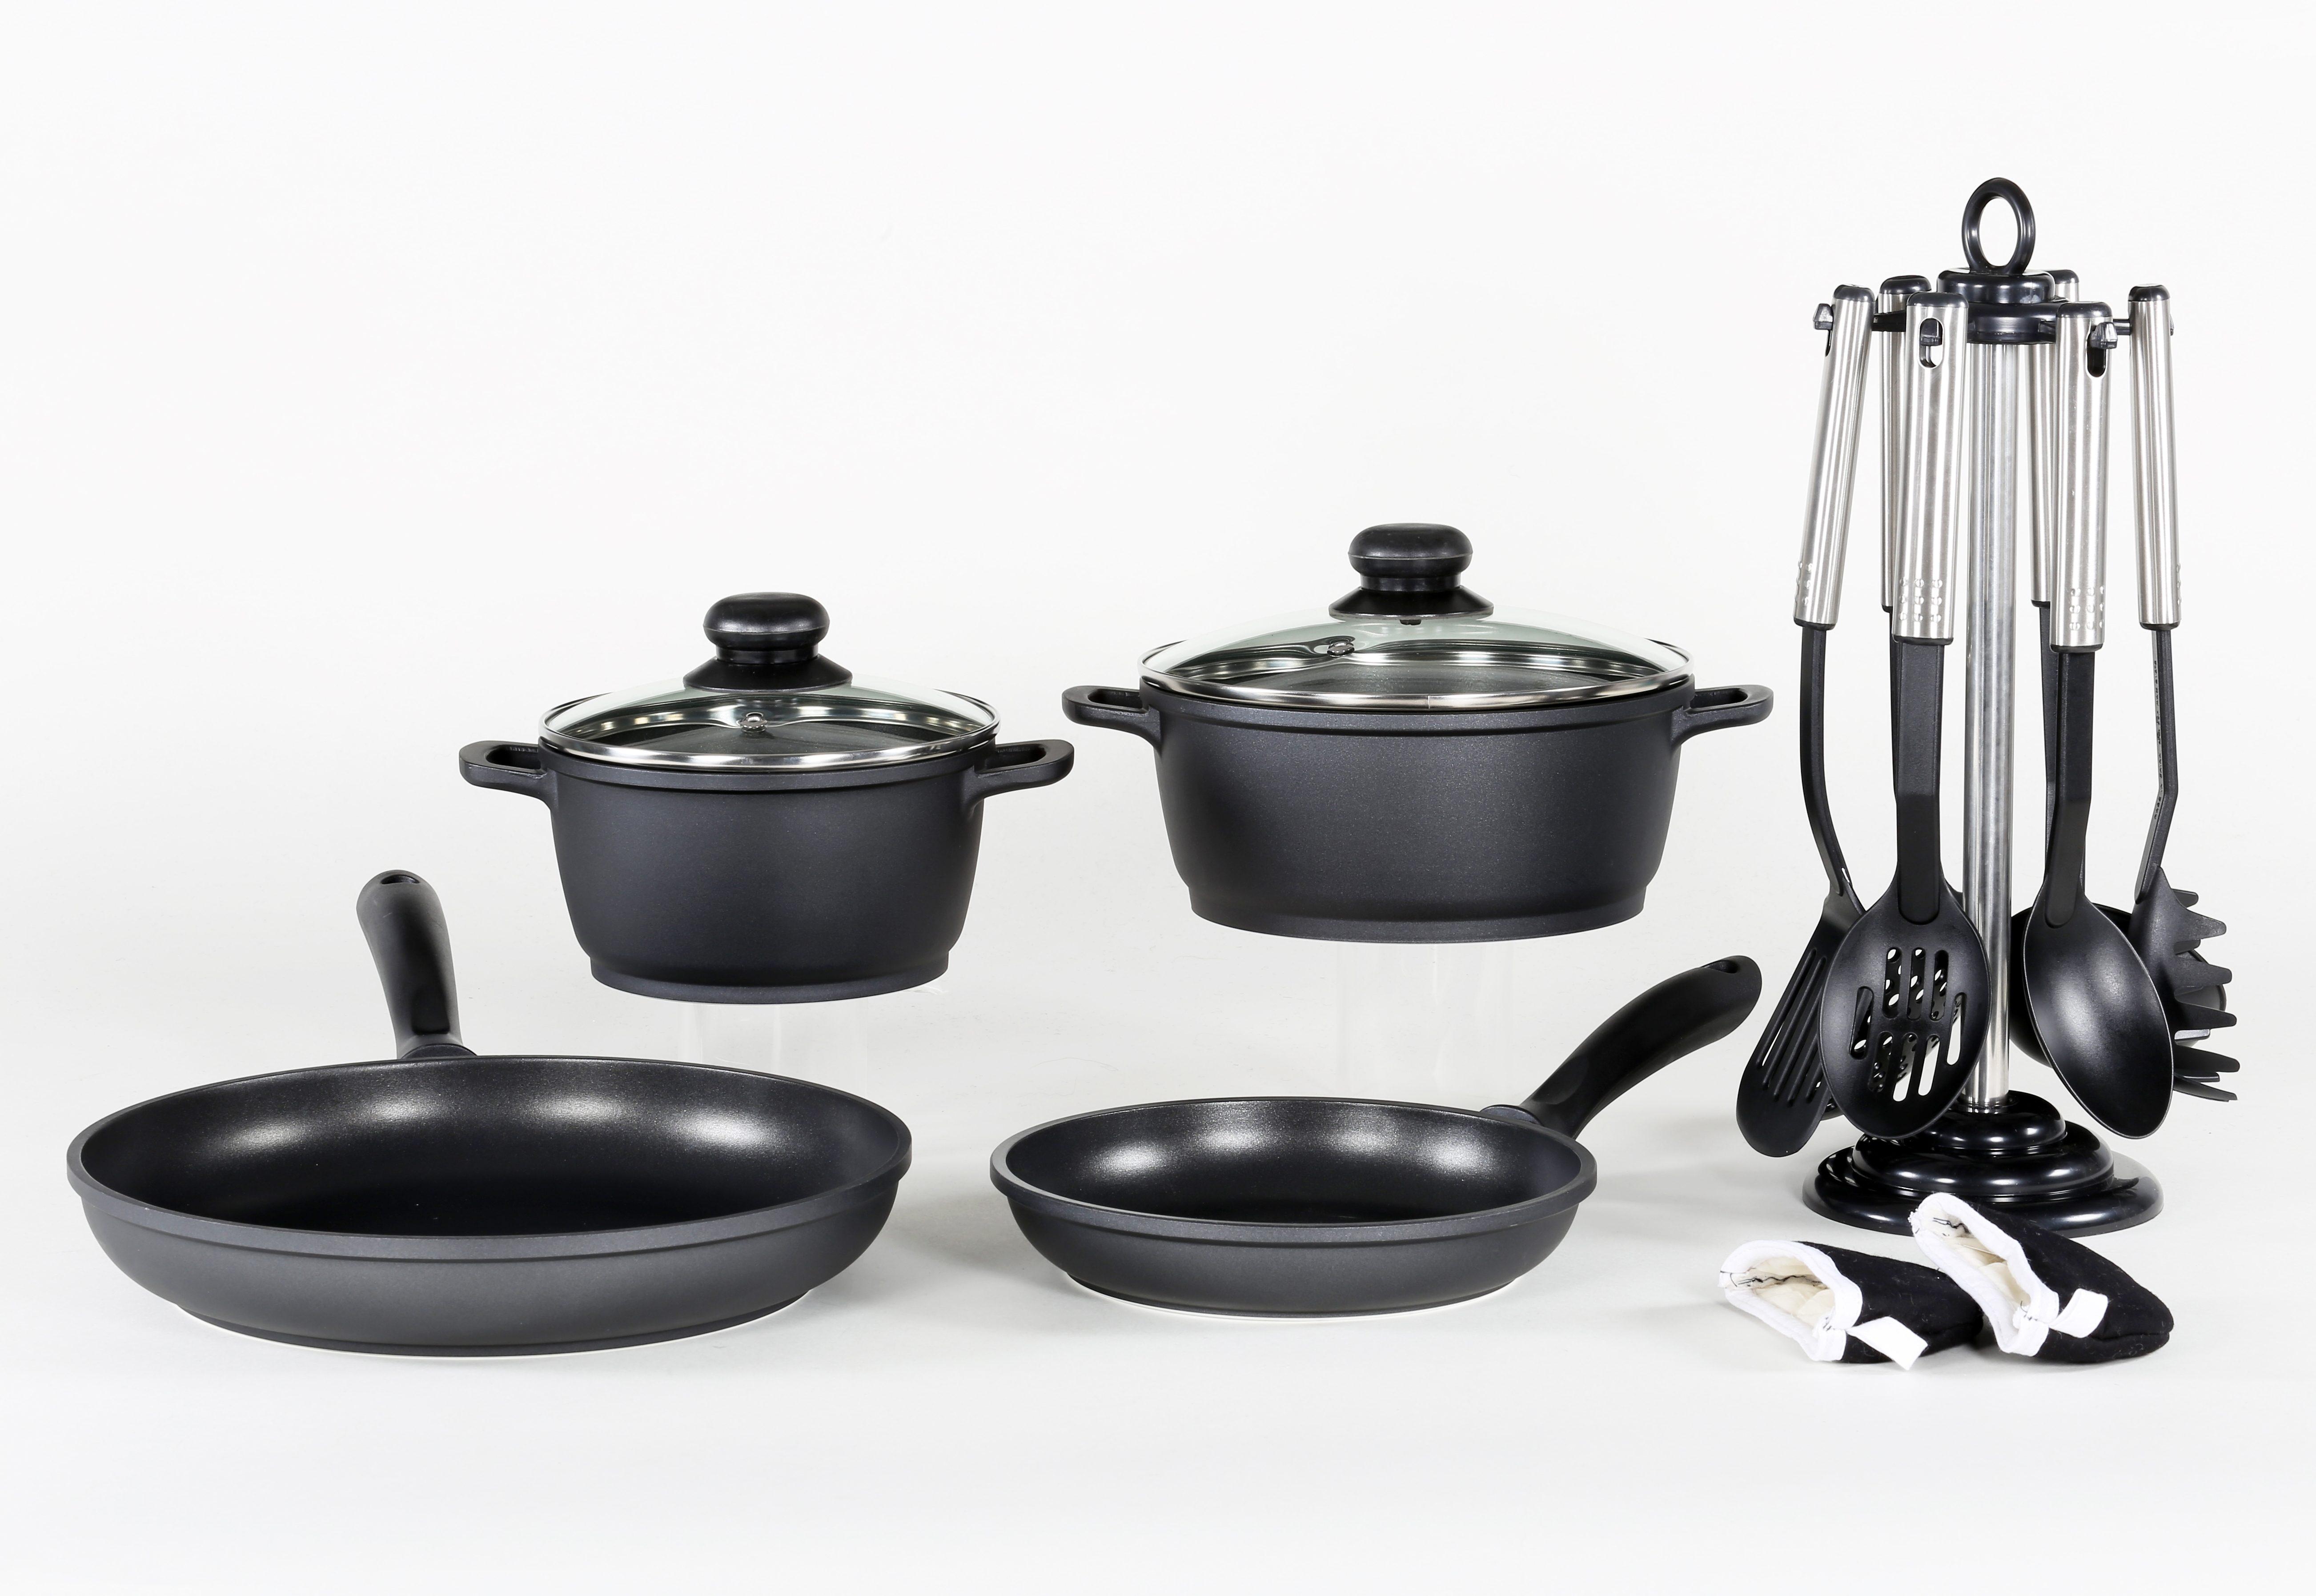 Aluguss-Kochserie 13-teilig, Krüger